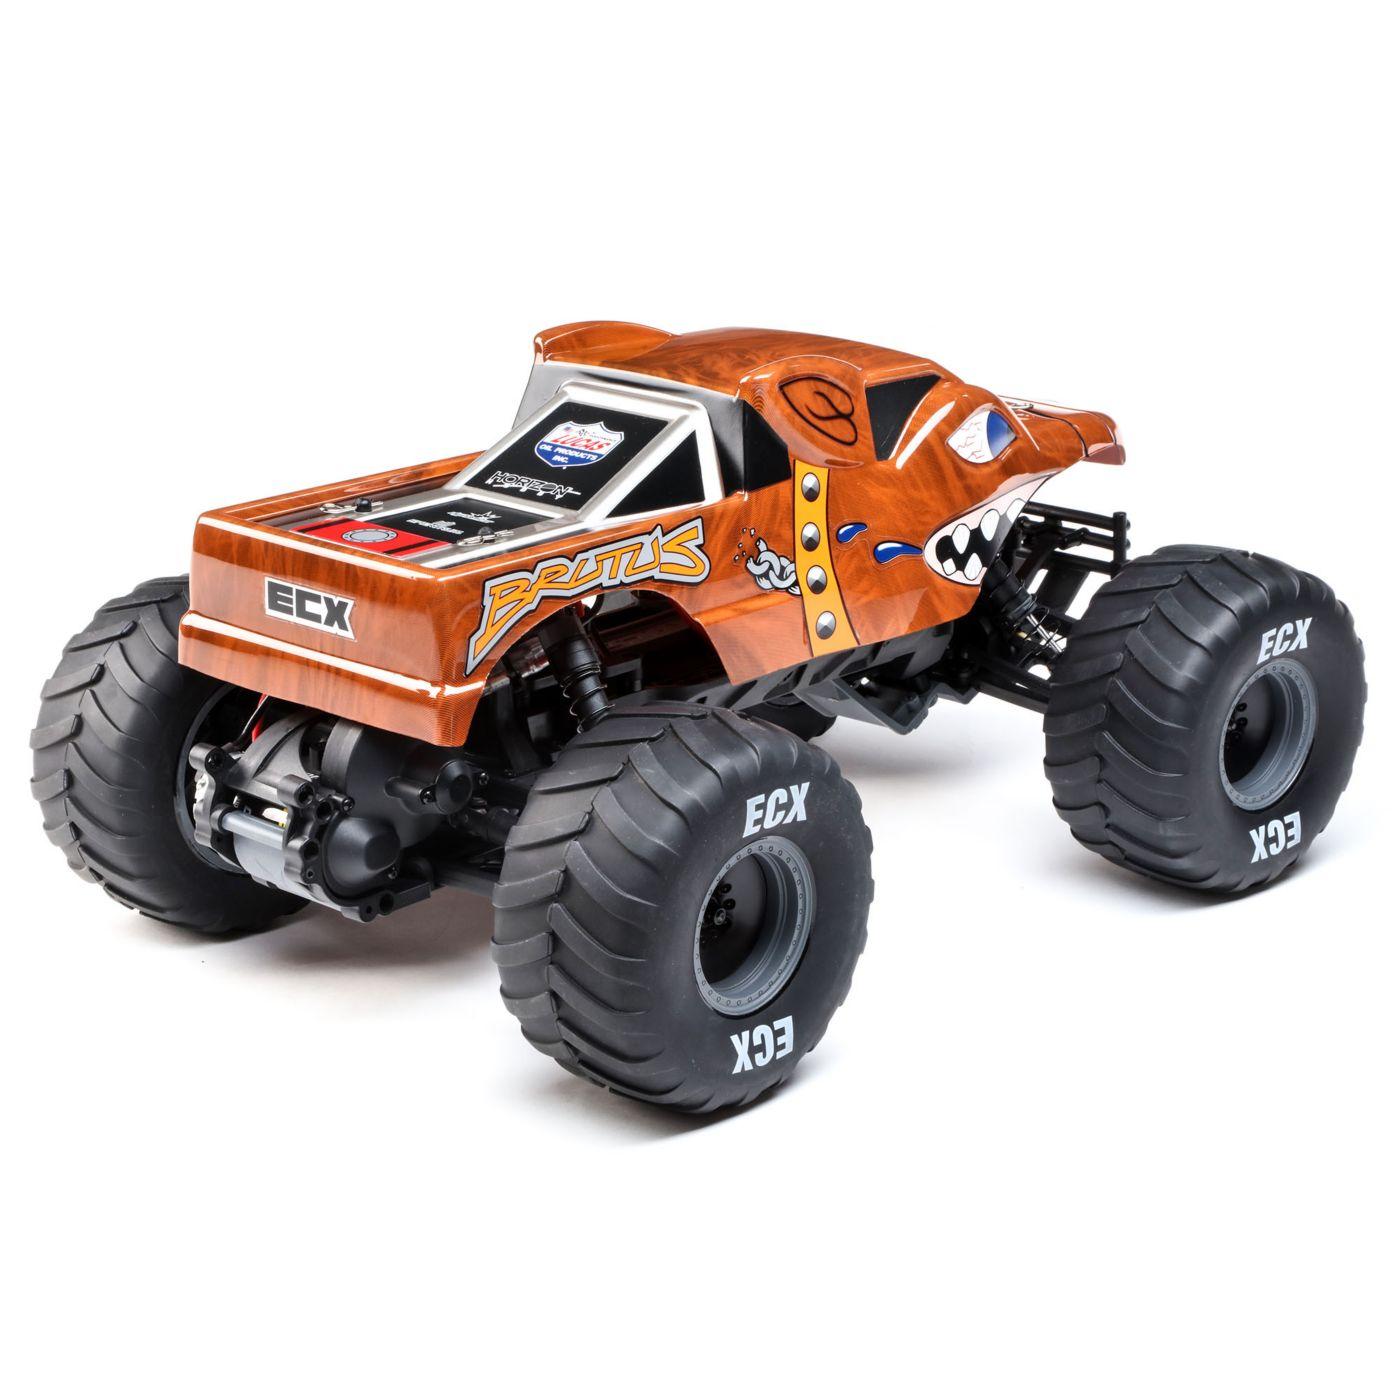 ECX Brutus 2WD Monster Truck - Rear